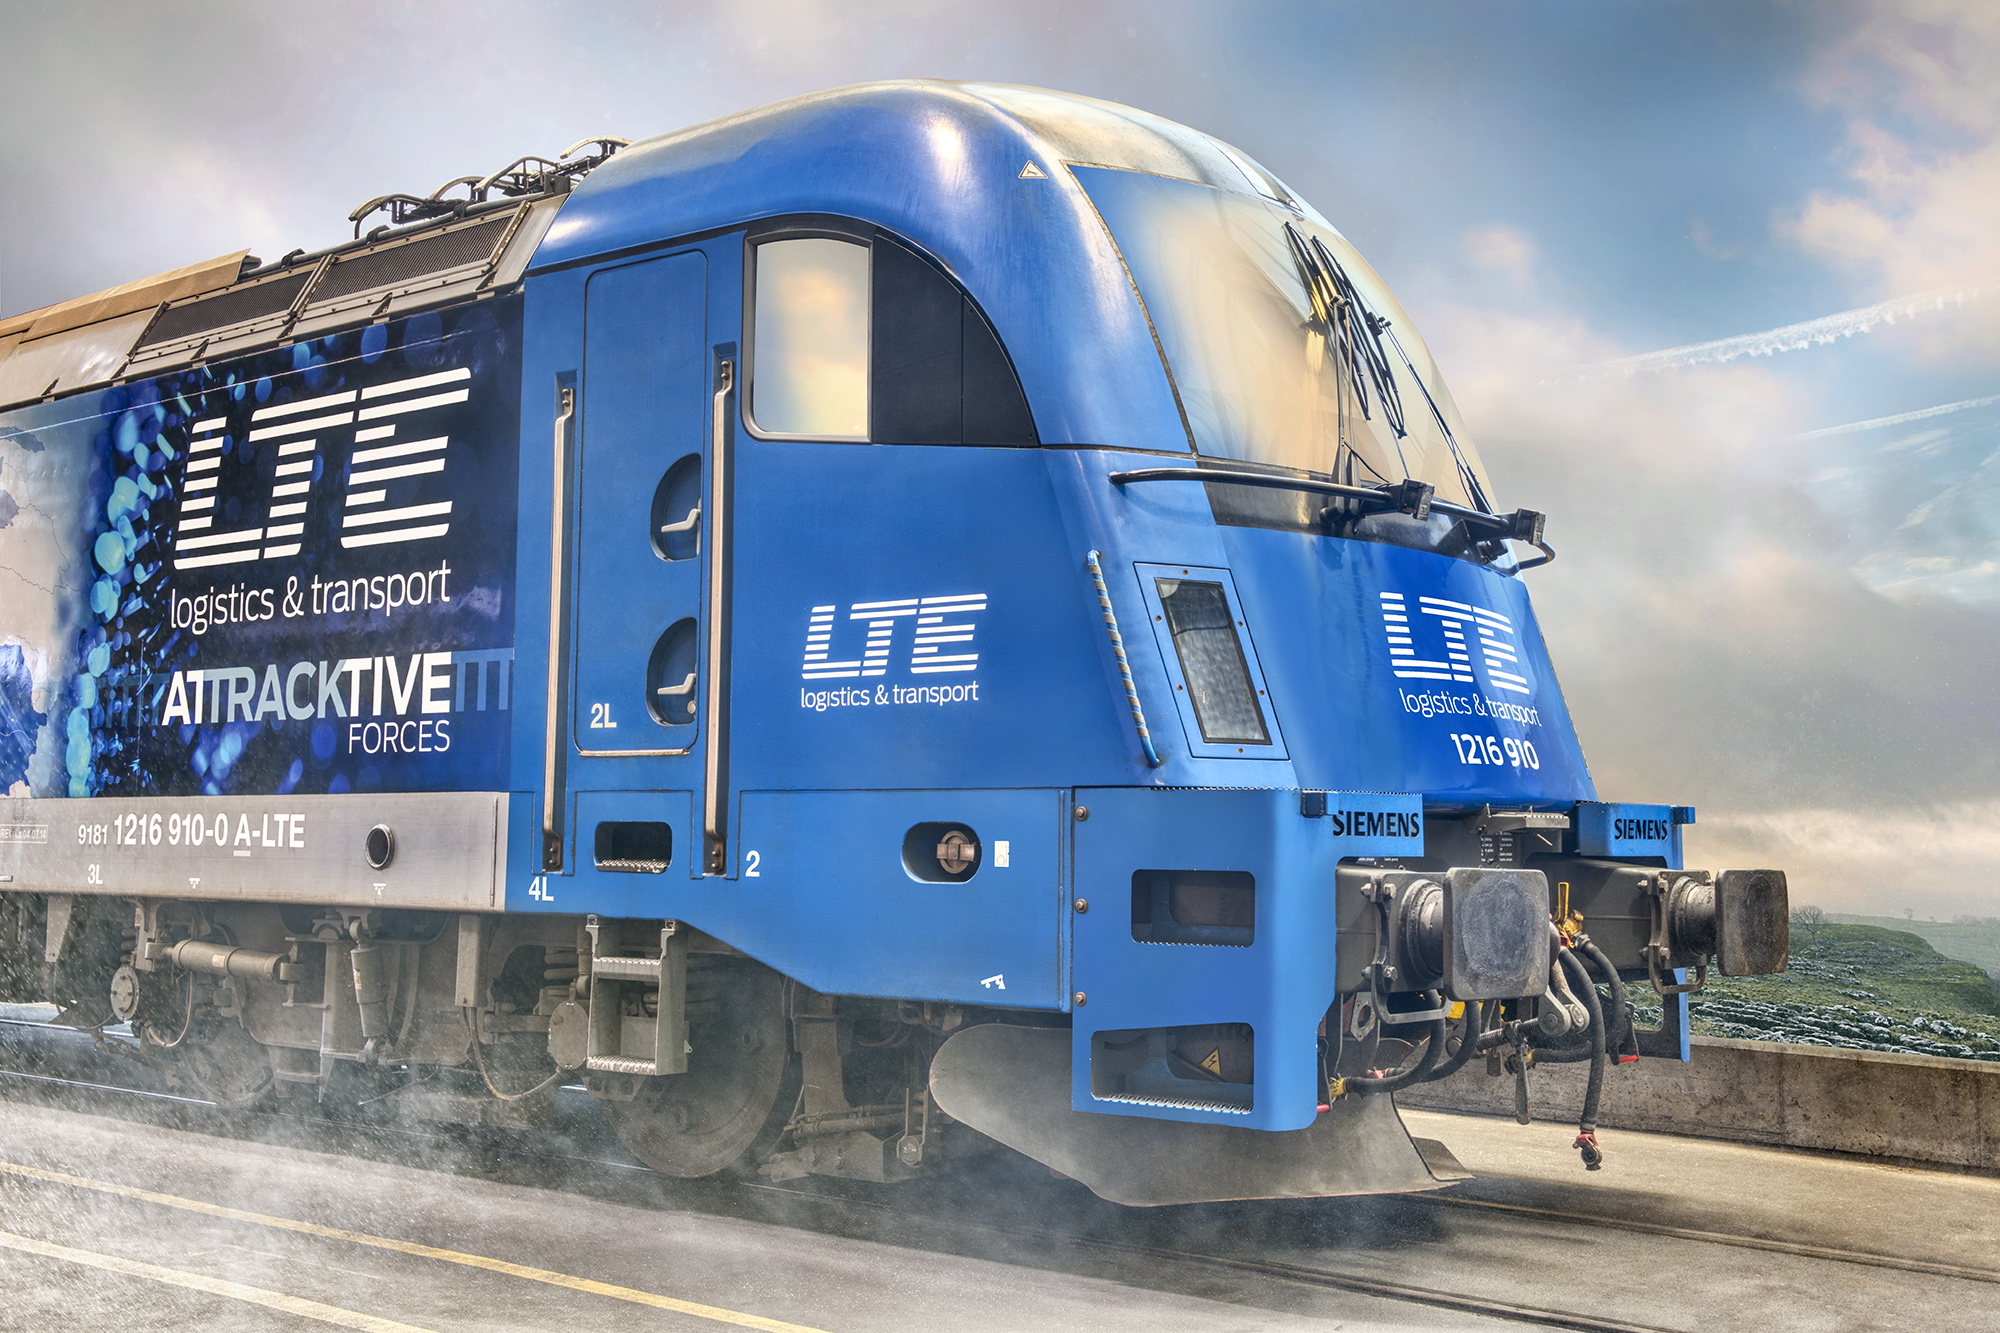 Attracktive Forces | LTE P. Strobl